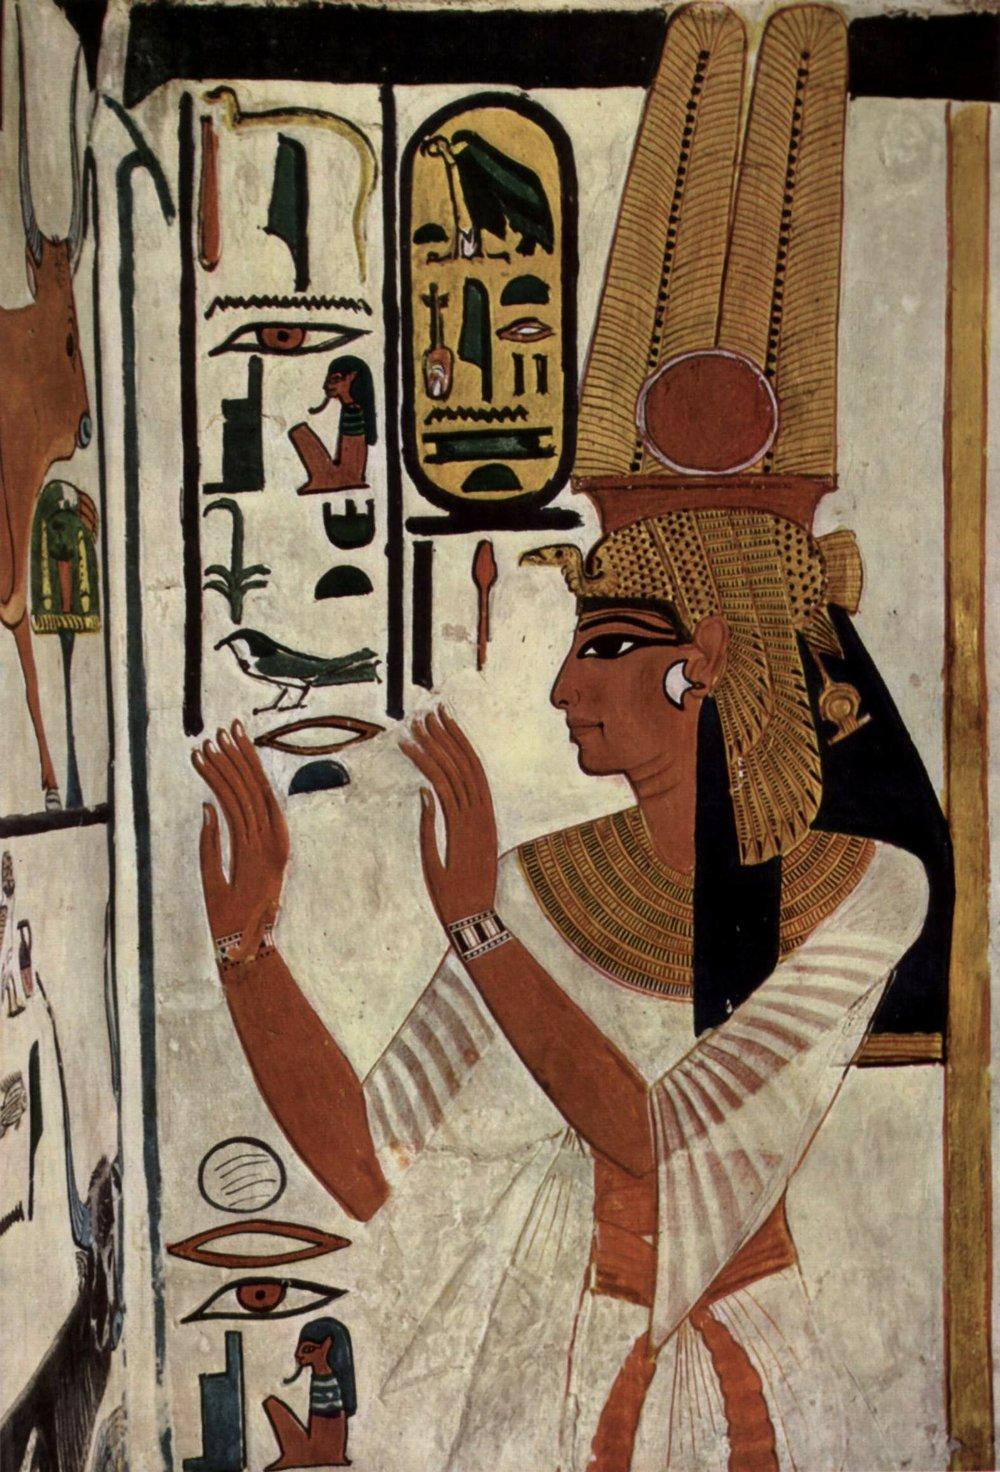 hieroglyphics-67471_1920.jpg